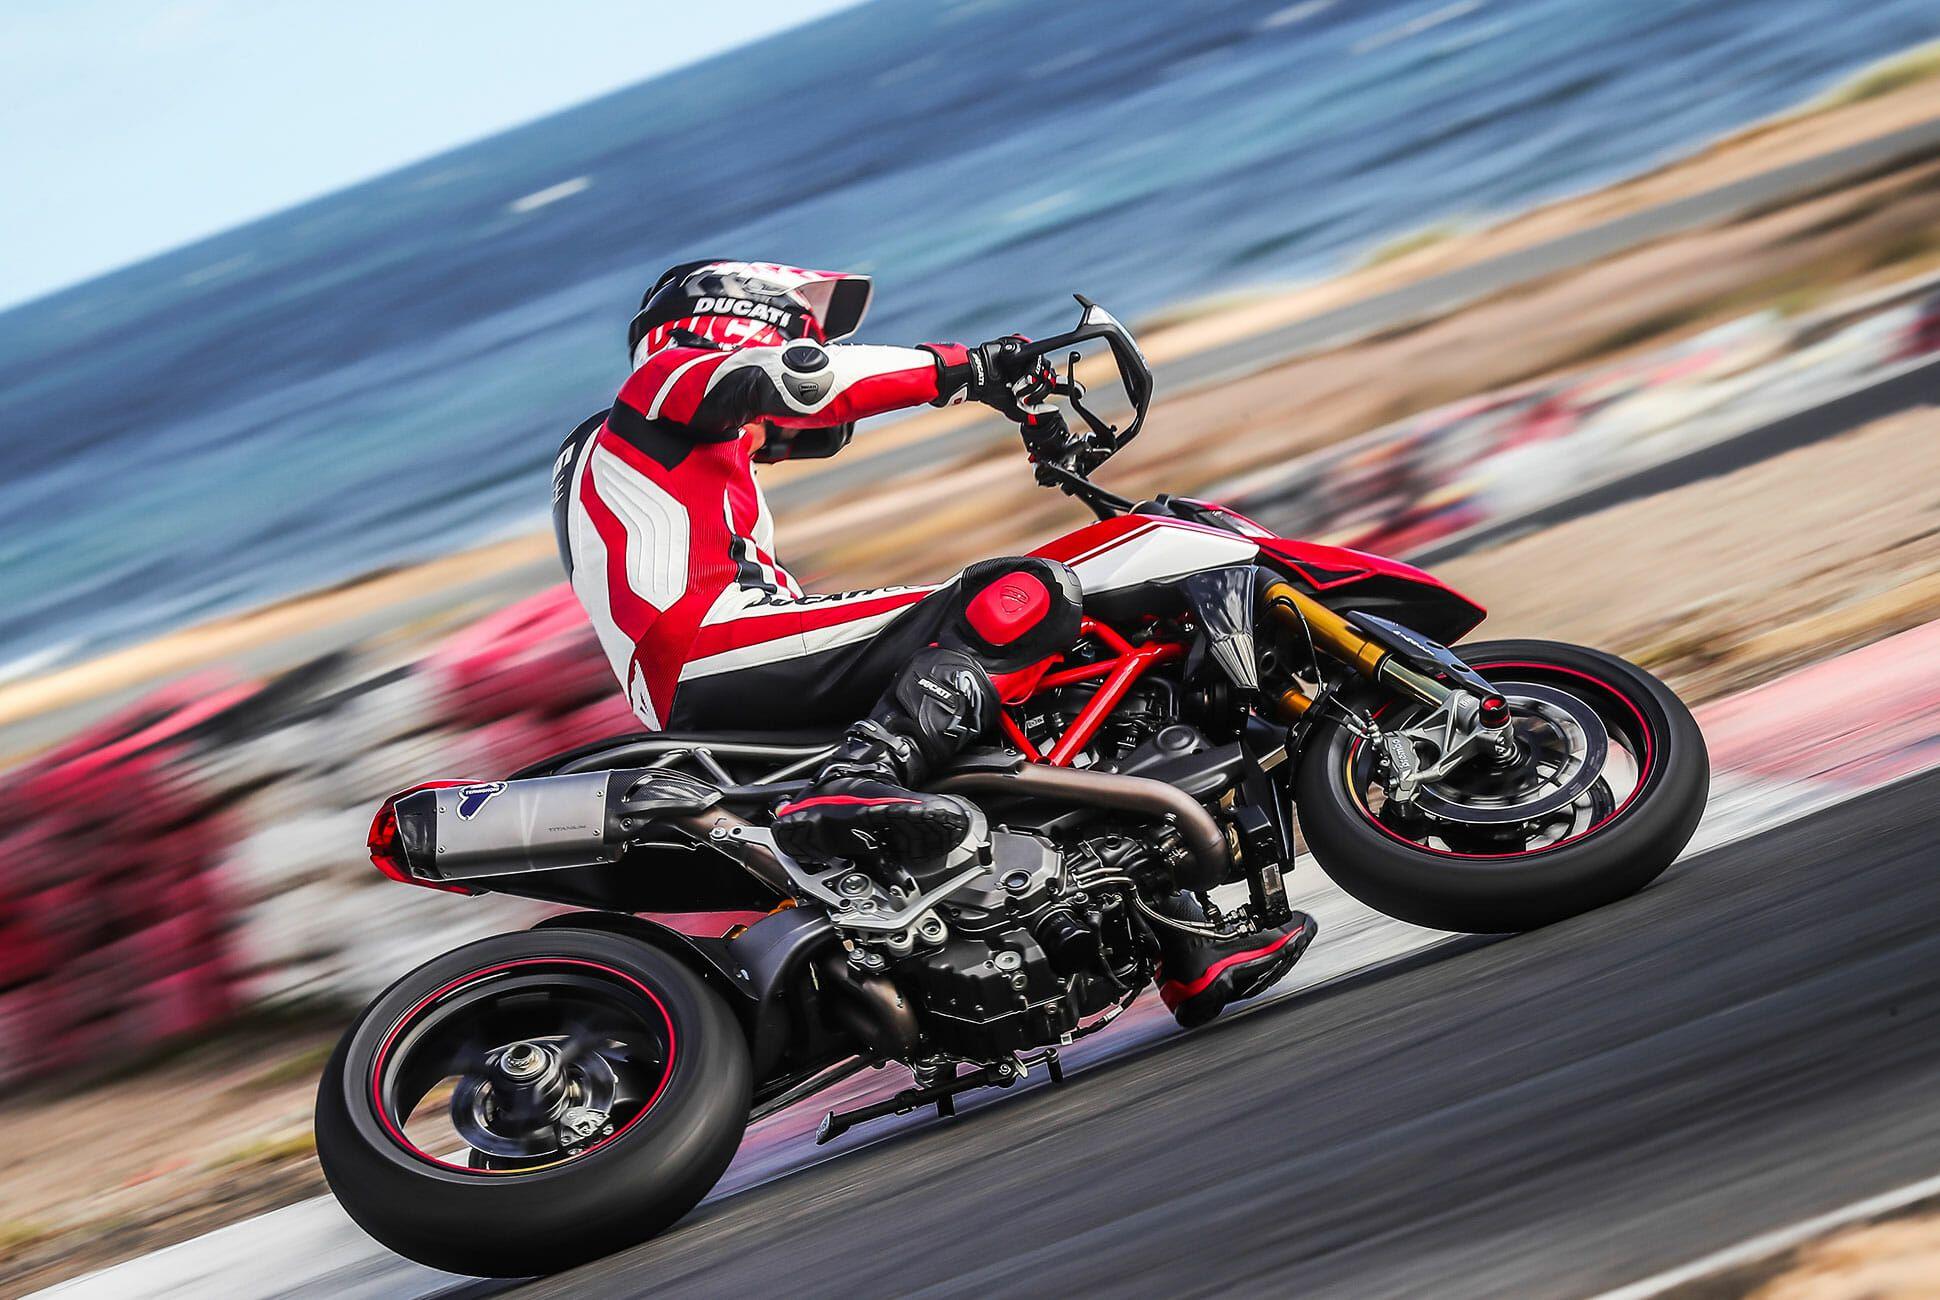 Ducati-Hypermotard-950-SP-Review-gear-patrol-slide-10